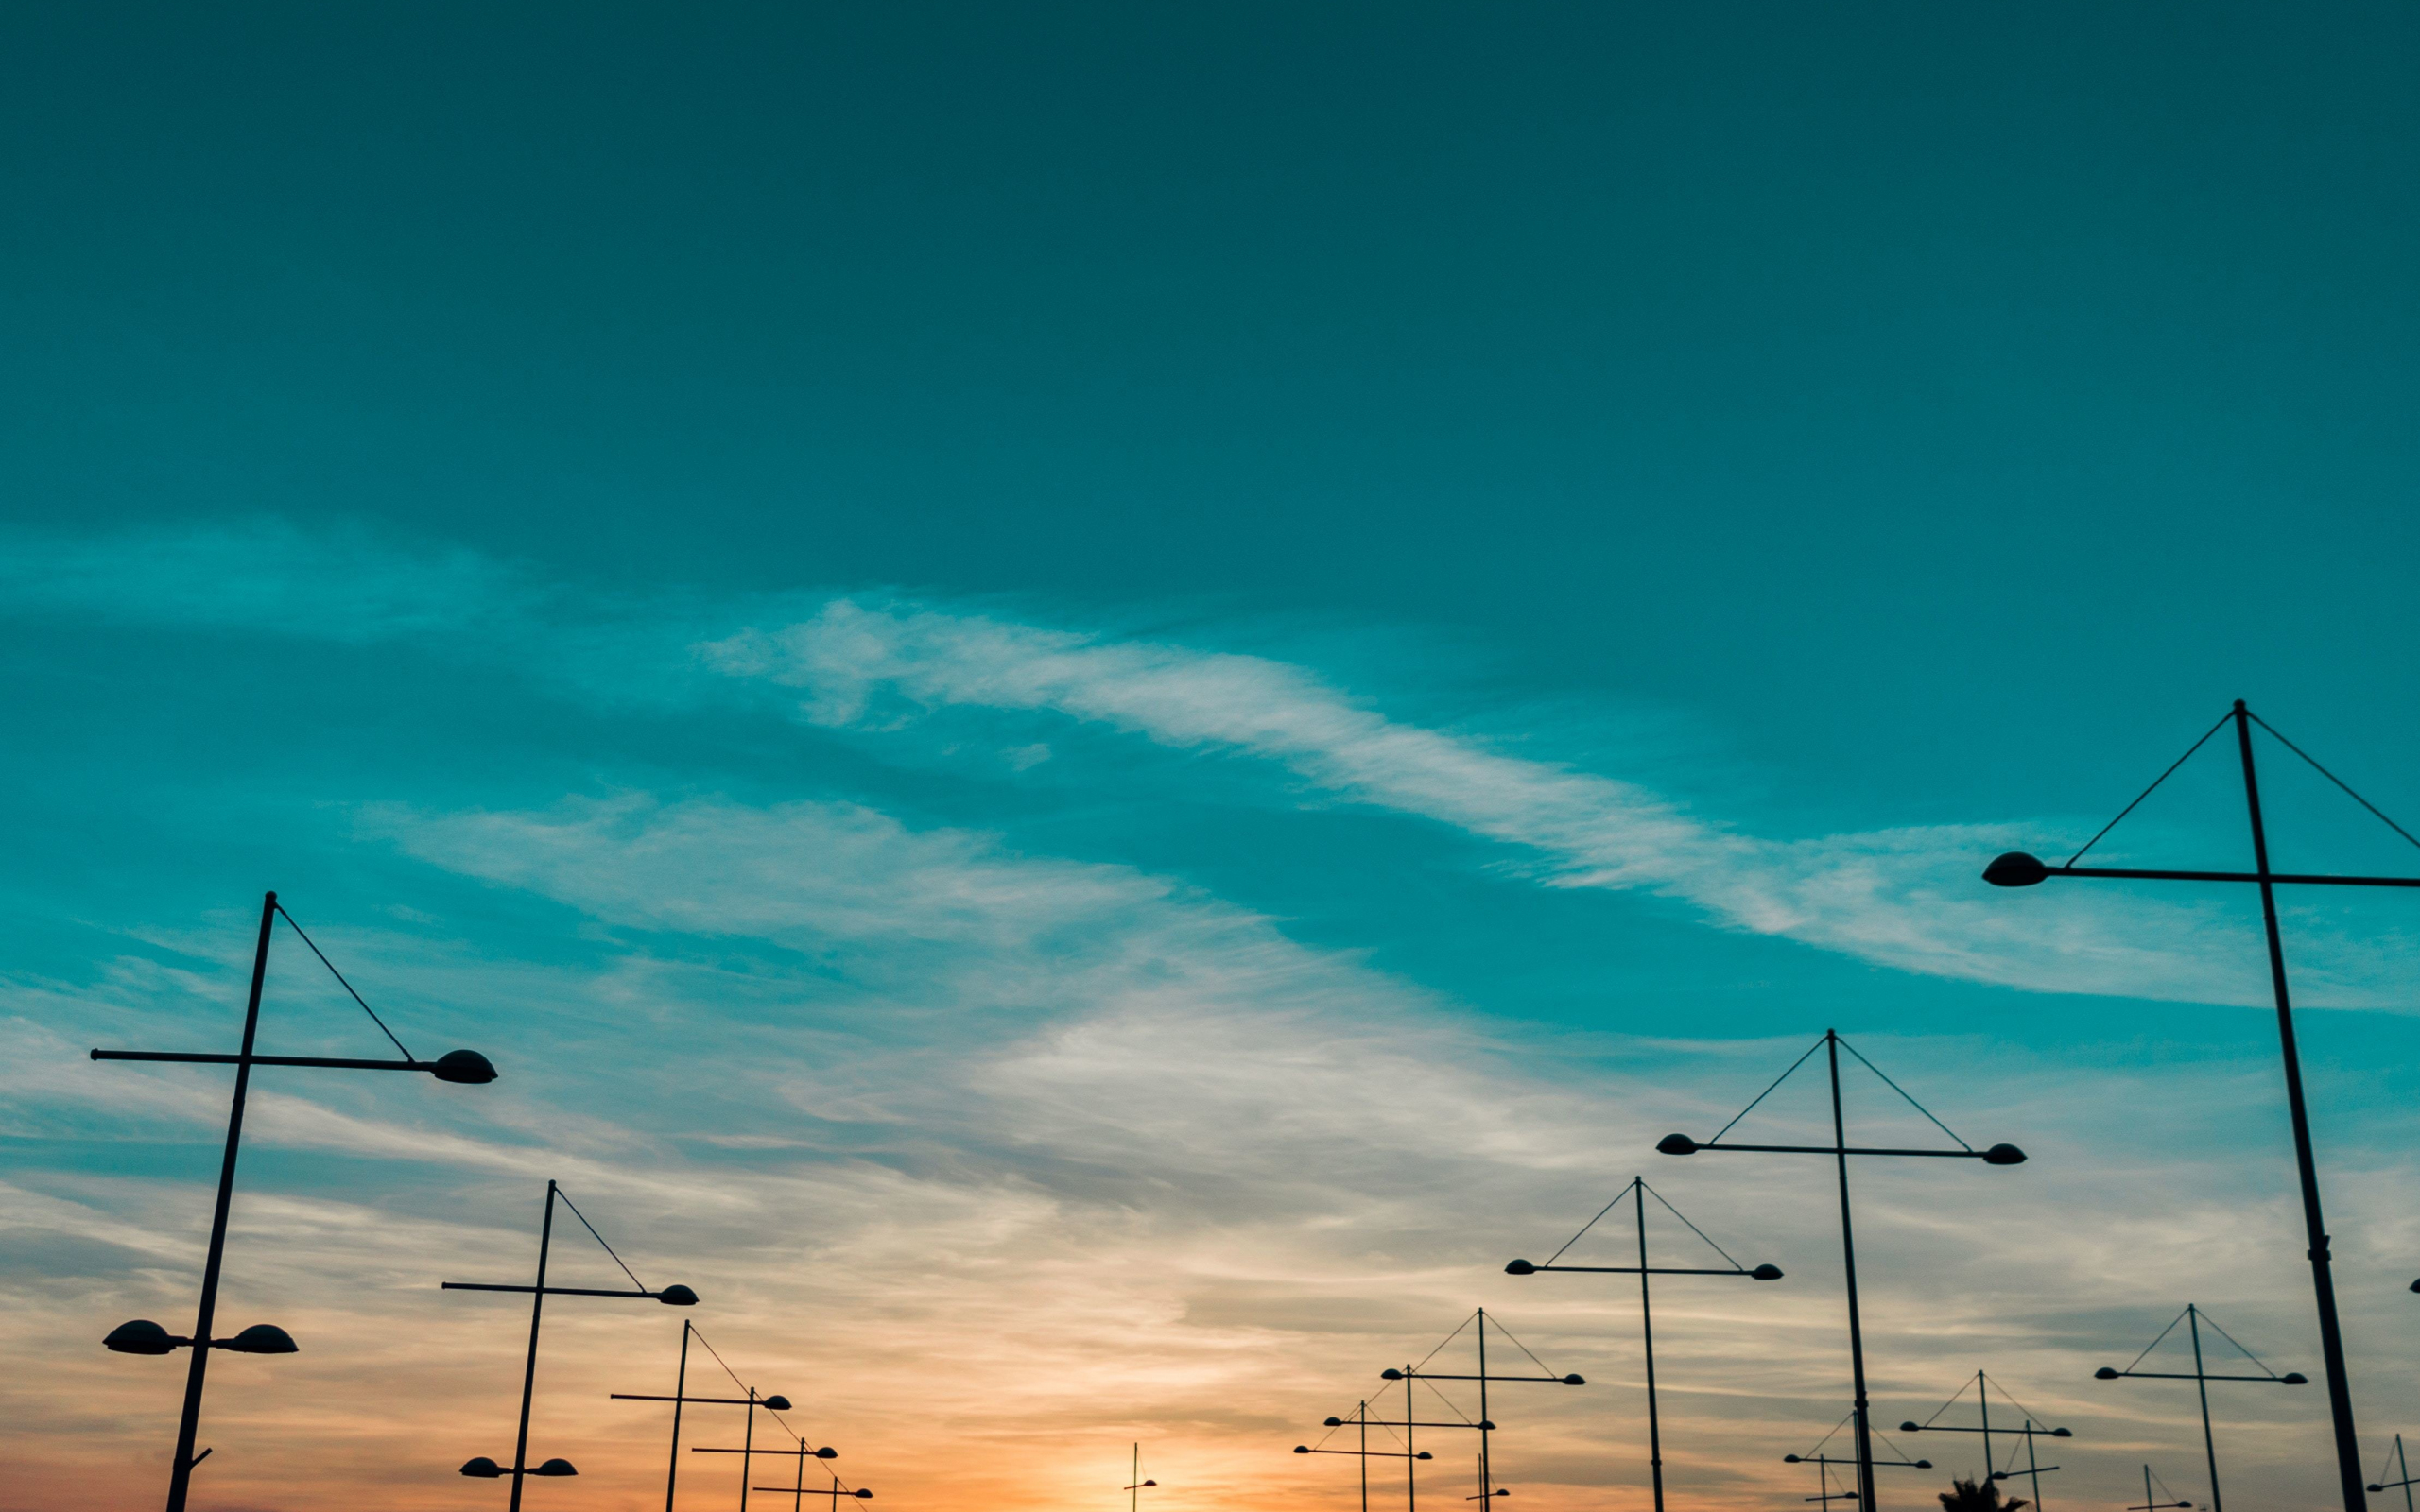 Sunset, landscape, skyline, 2560x1600 wallpaper